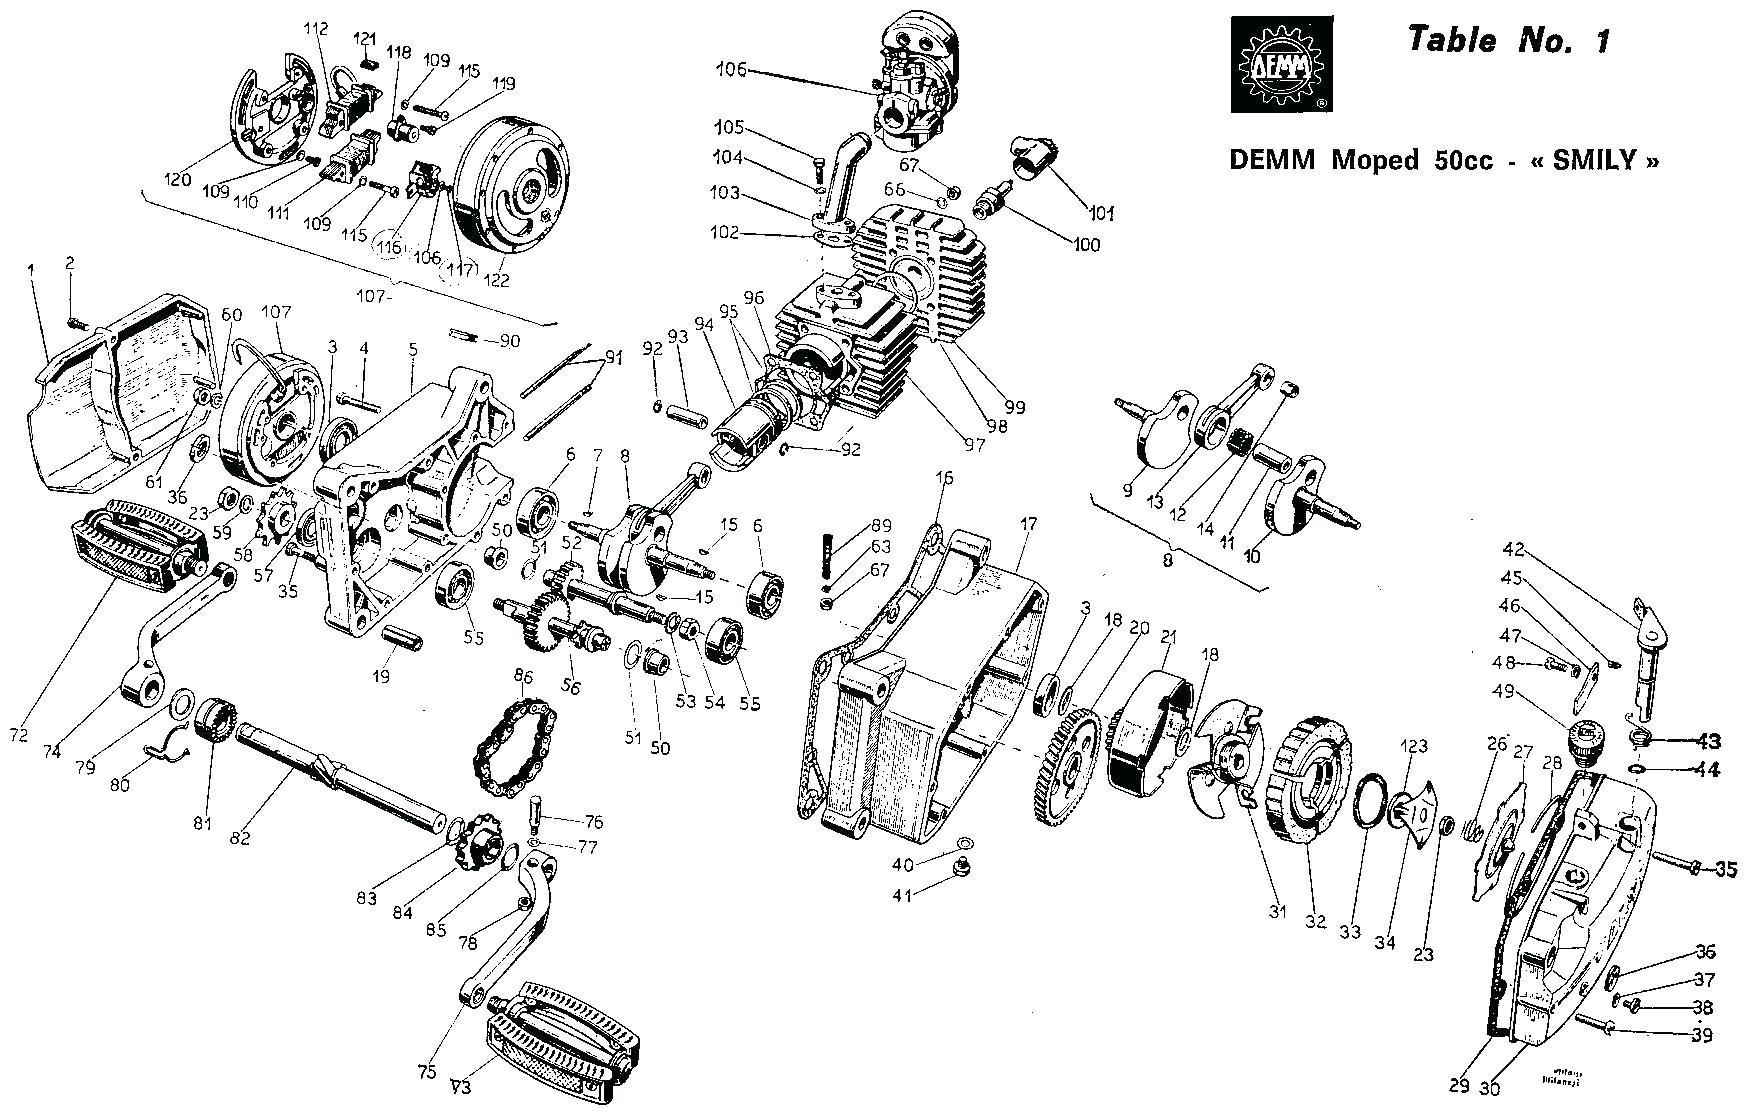 hight resolution of a35 wiring diagram wiring library rh 59 nmun berlin de cat 6 wiring diagram switch wiring